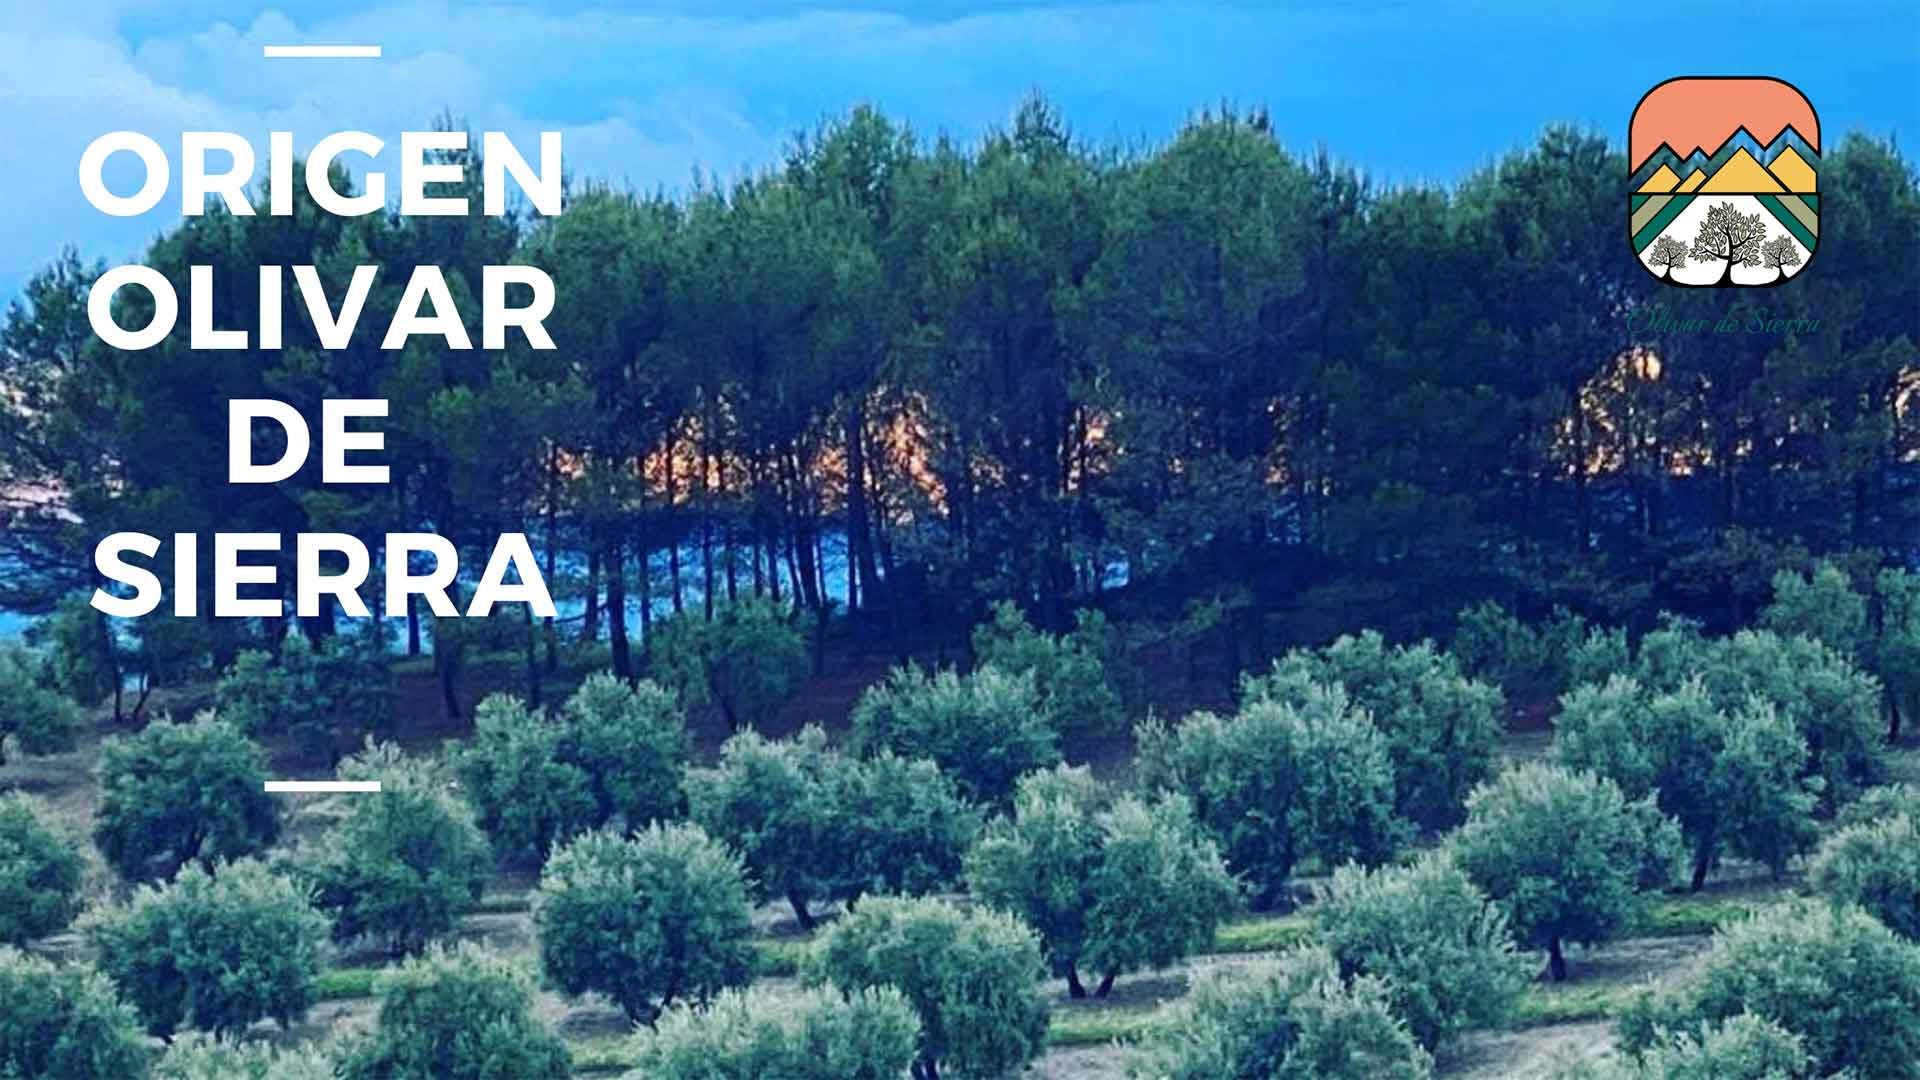 Extra virgin olive oil. Origin, olivar de sierra